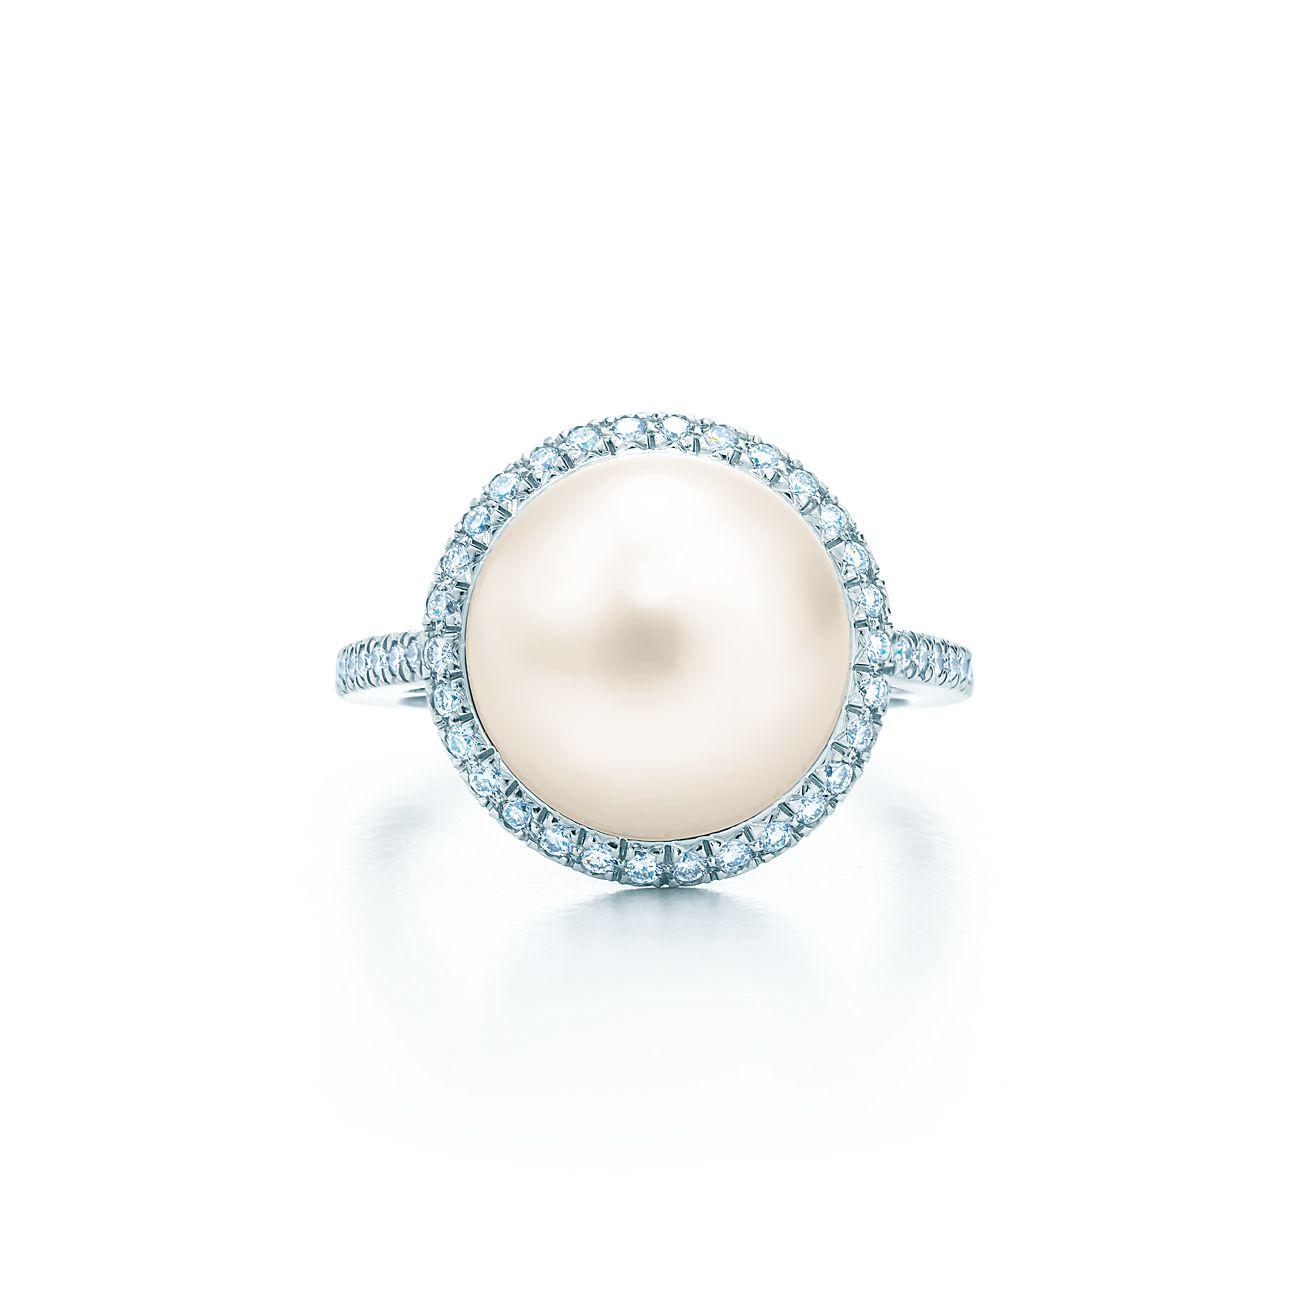 Tiffany South Sea Noble:pearl Ring